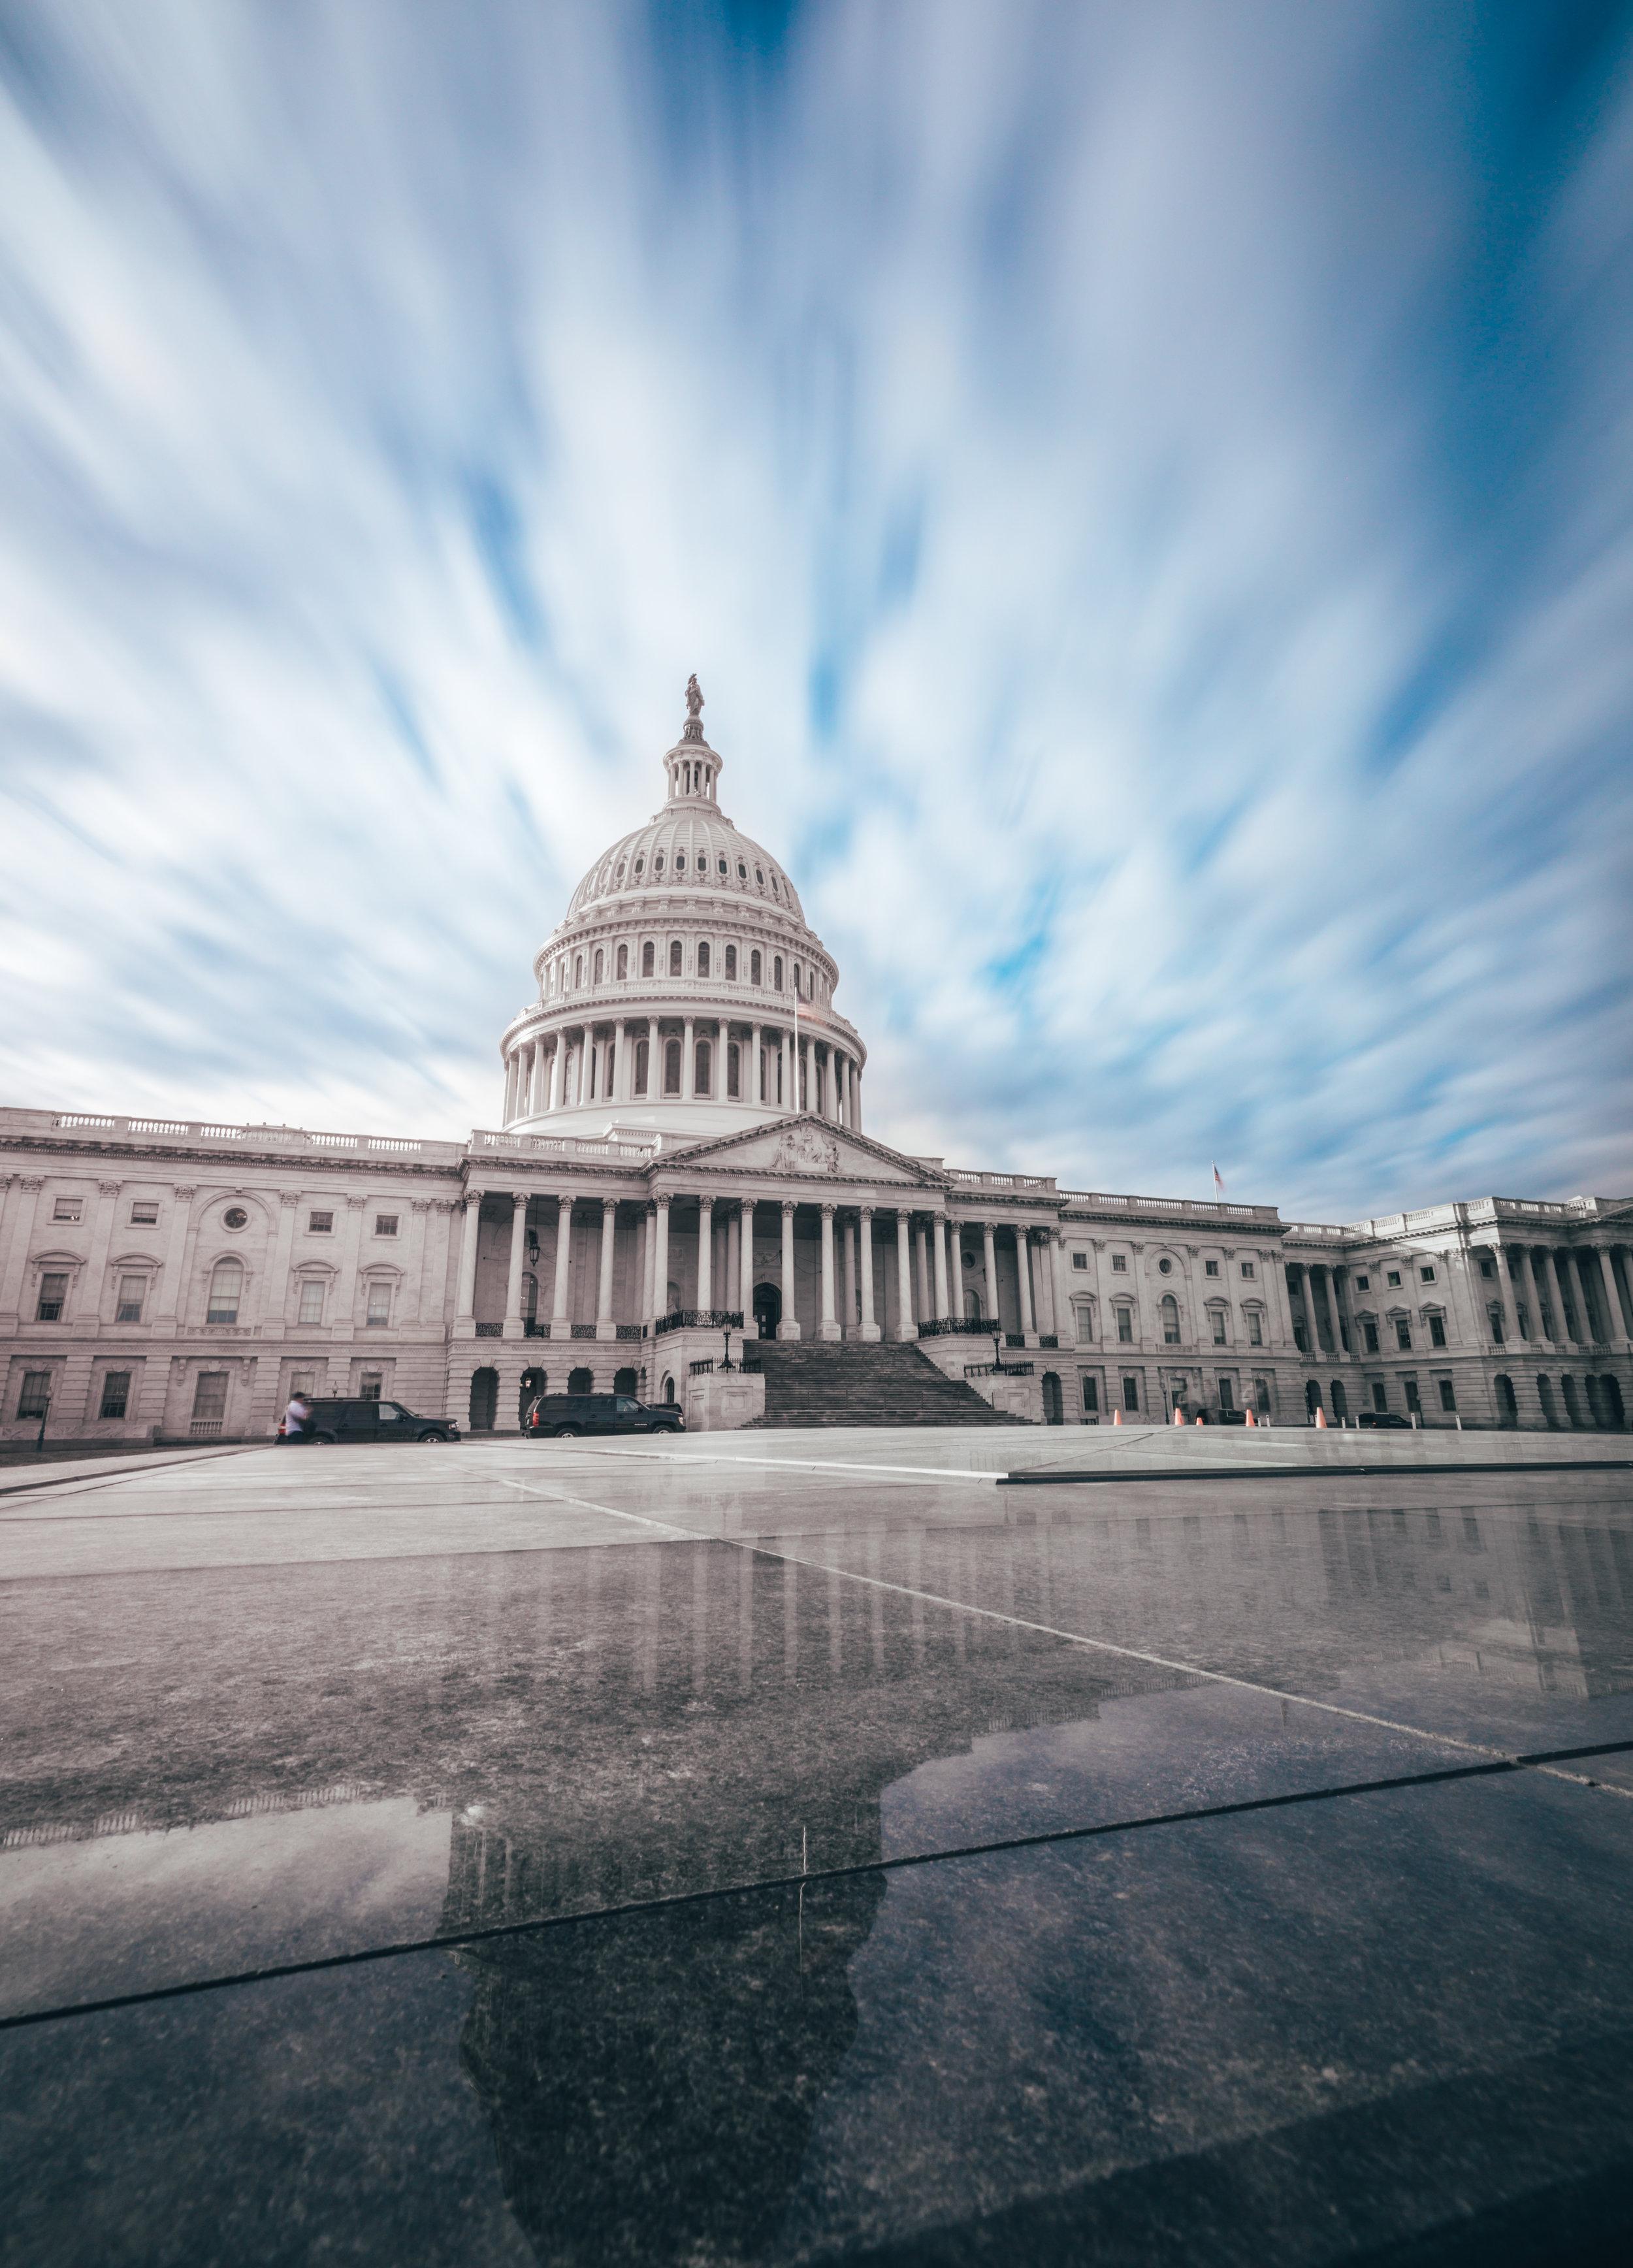 us-capitol-building-washington-dc-government-places-monuments-27b970-1024.jpg